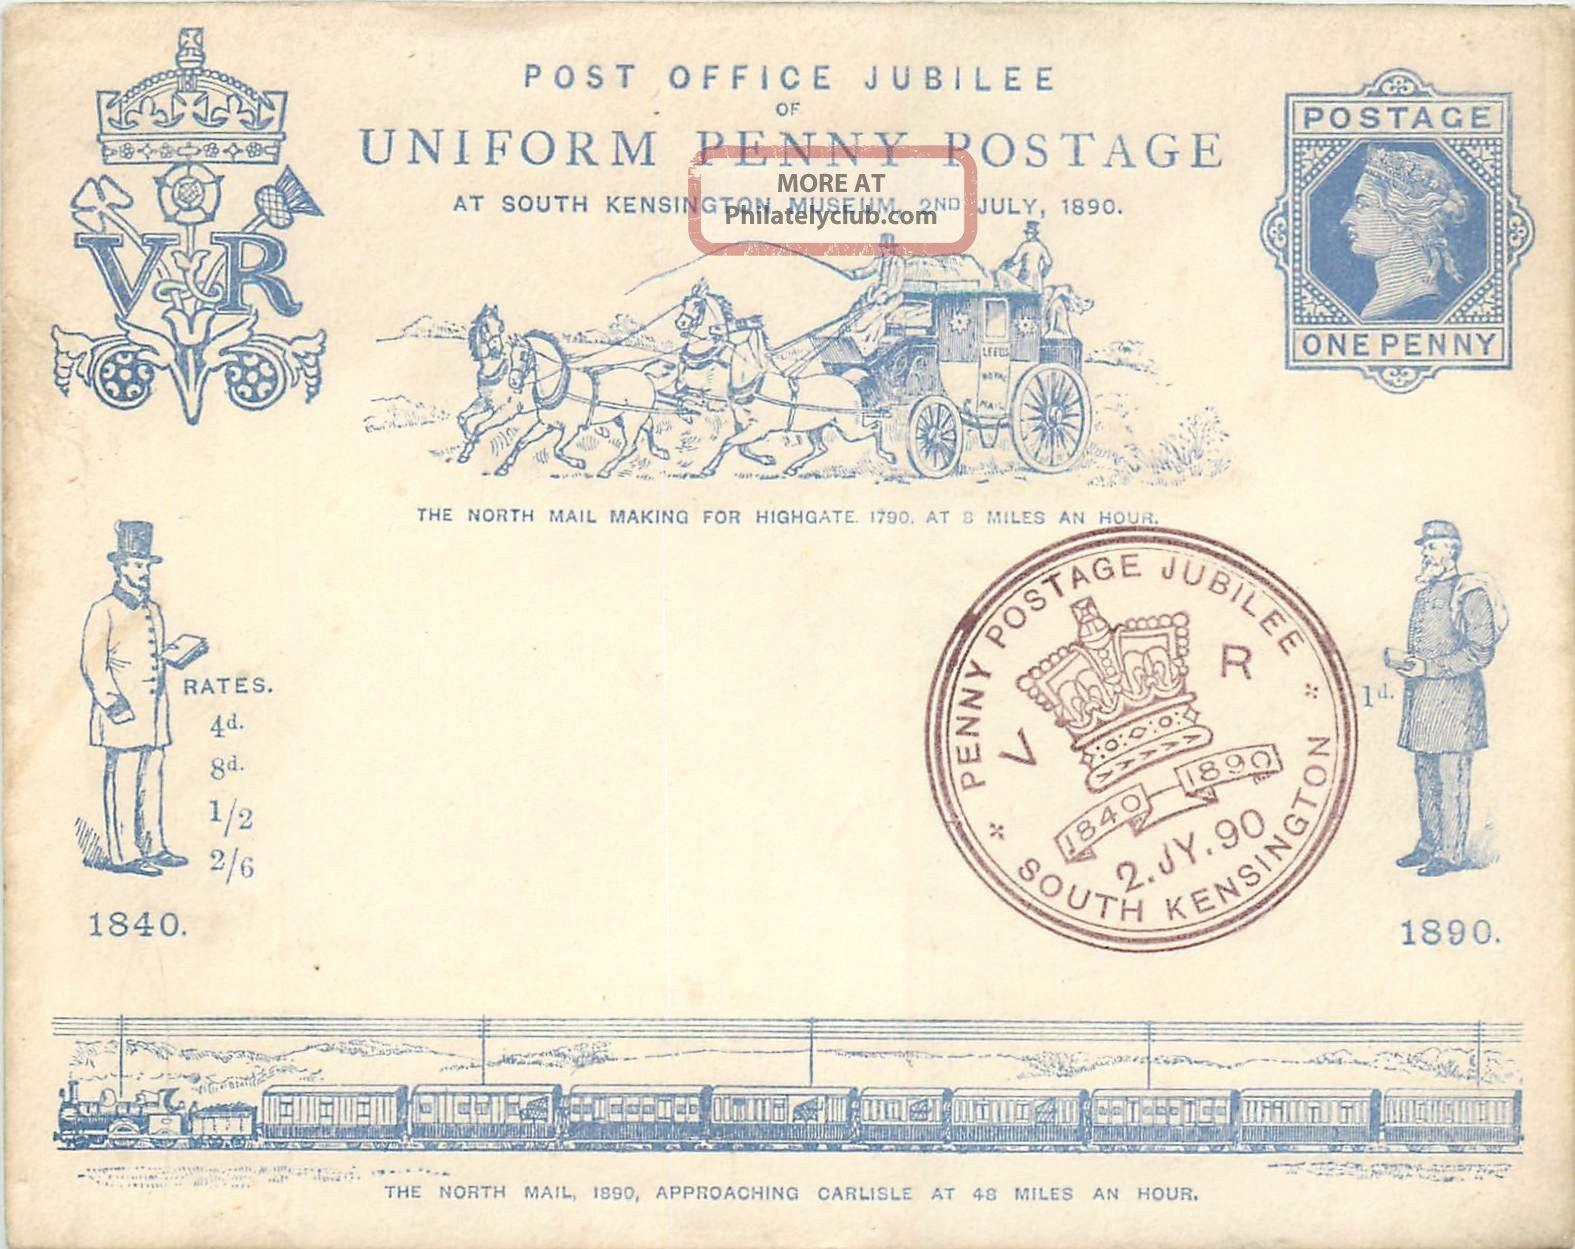 Great Britain 1890 Post Office Jubilee Uniform Penny Postage - South Kensington Worldwide photo